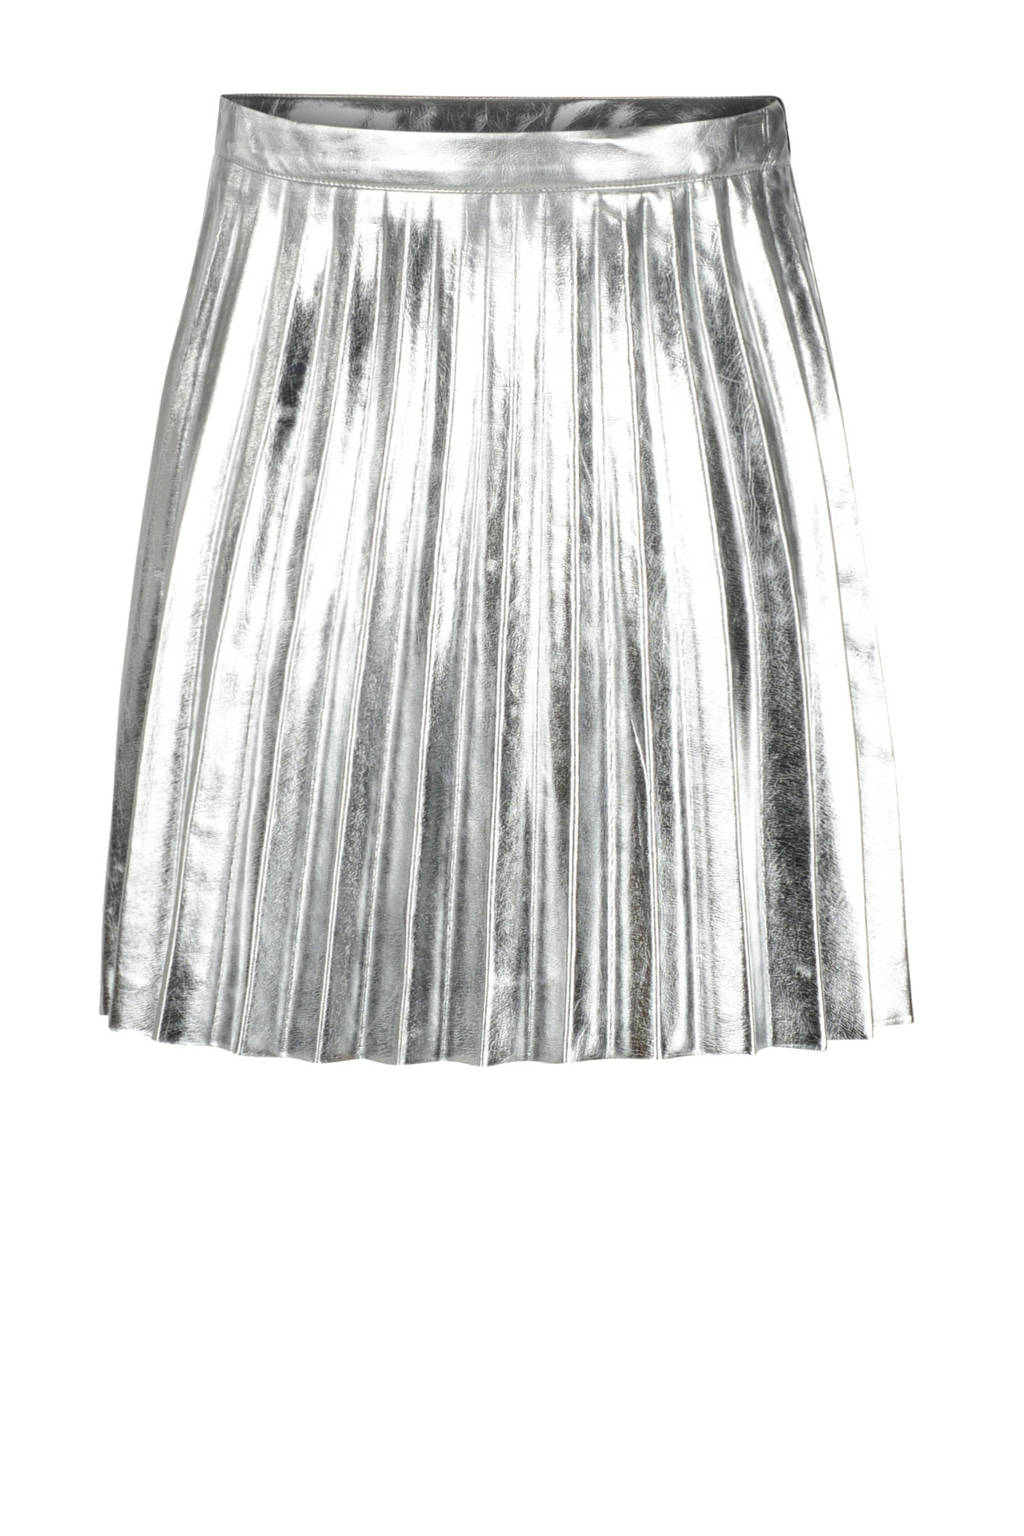 Jill & Mitch by Shoeby imitatieleren plissé rok Silver zilver, Zilver